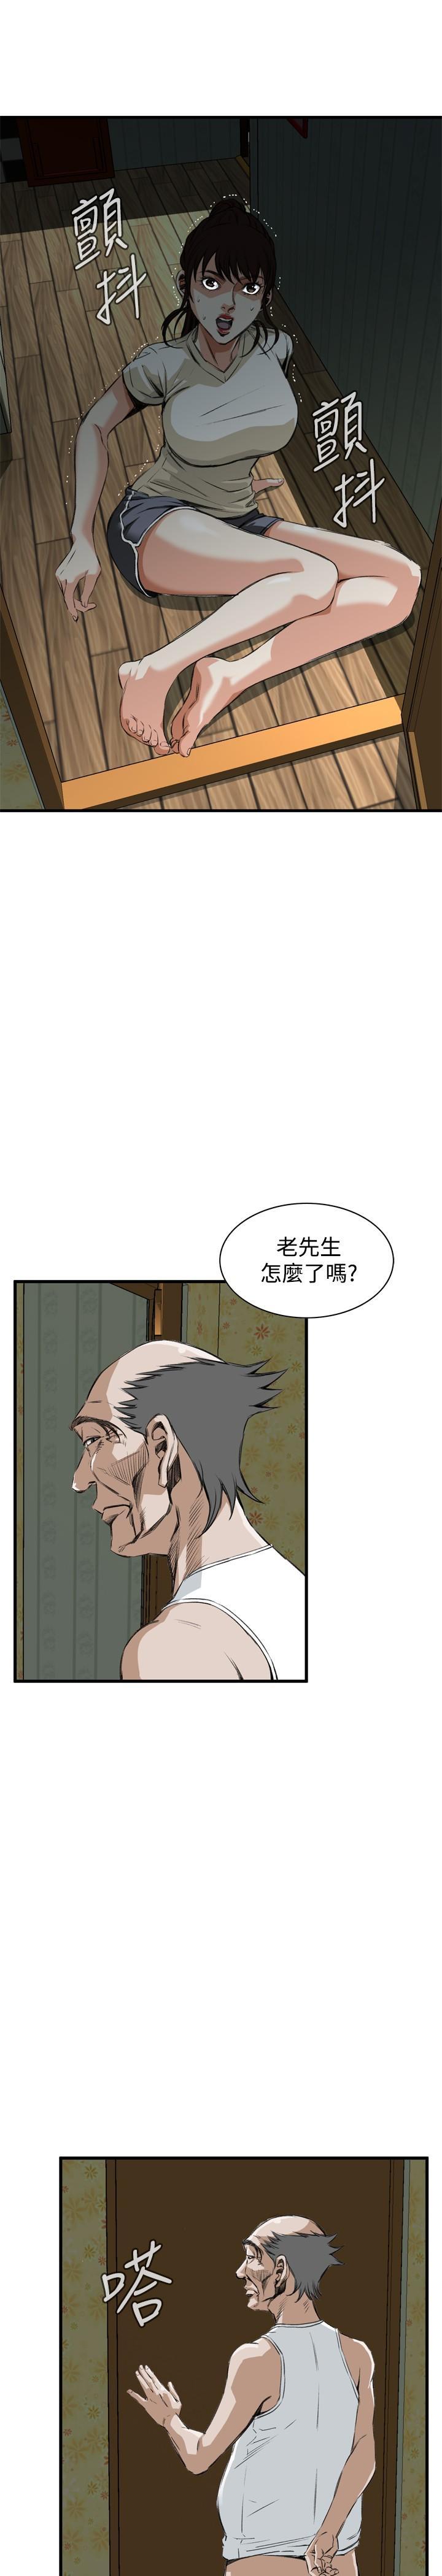 Take a Peek 偷窥 Ch.39~55 [Chinese]中文 179